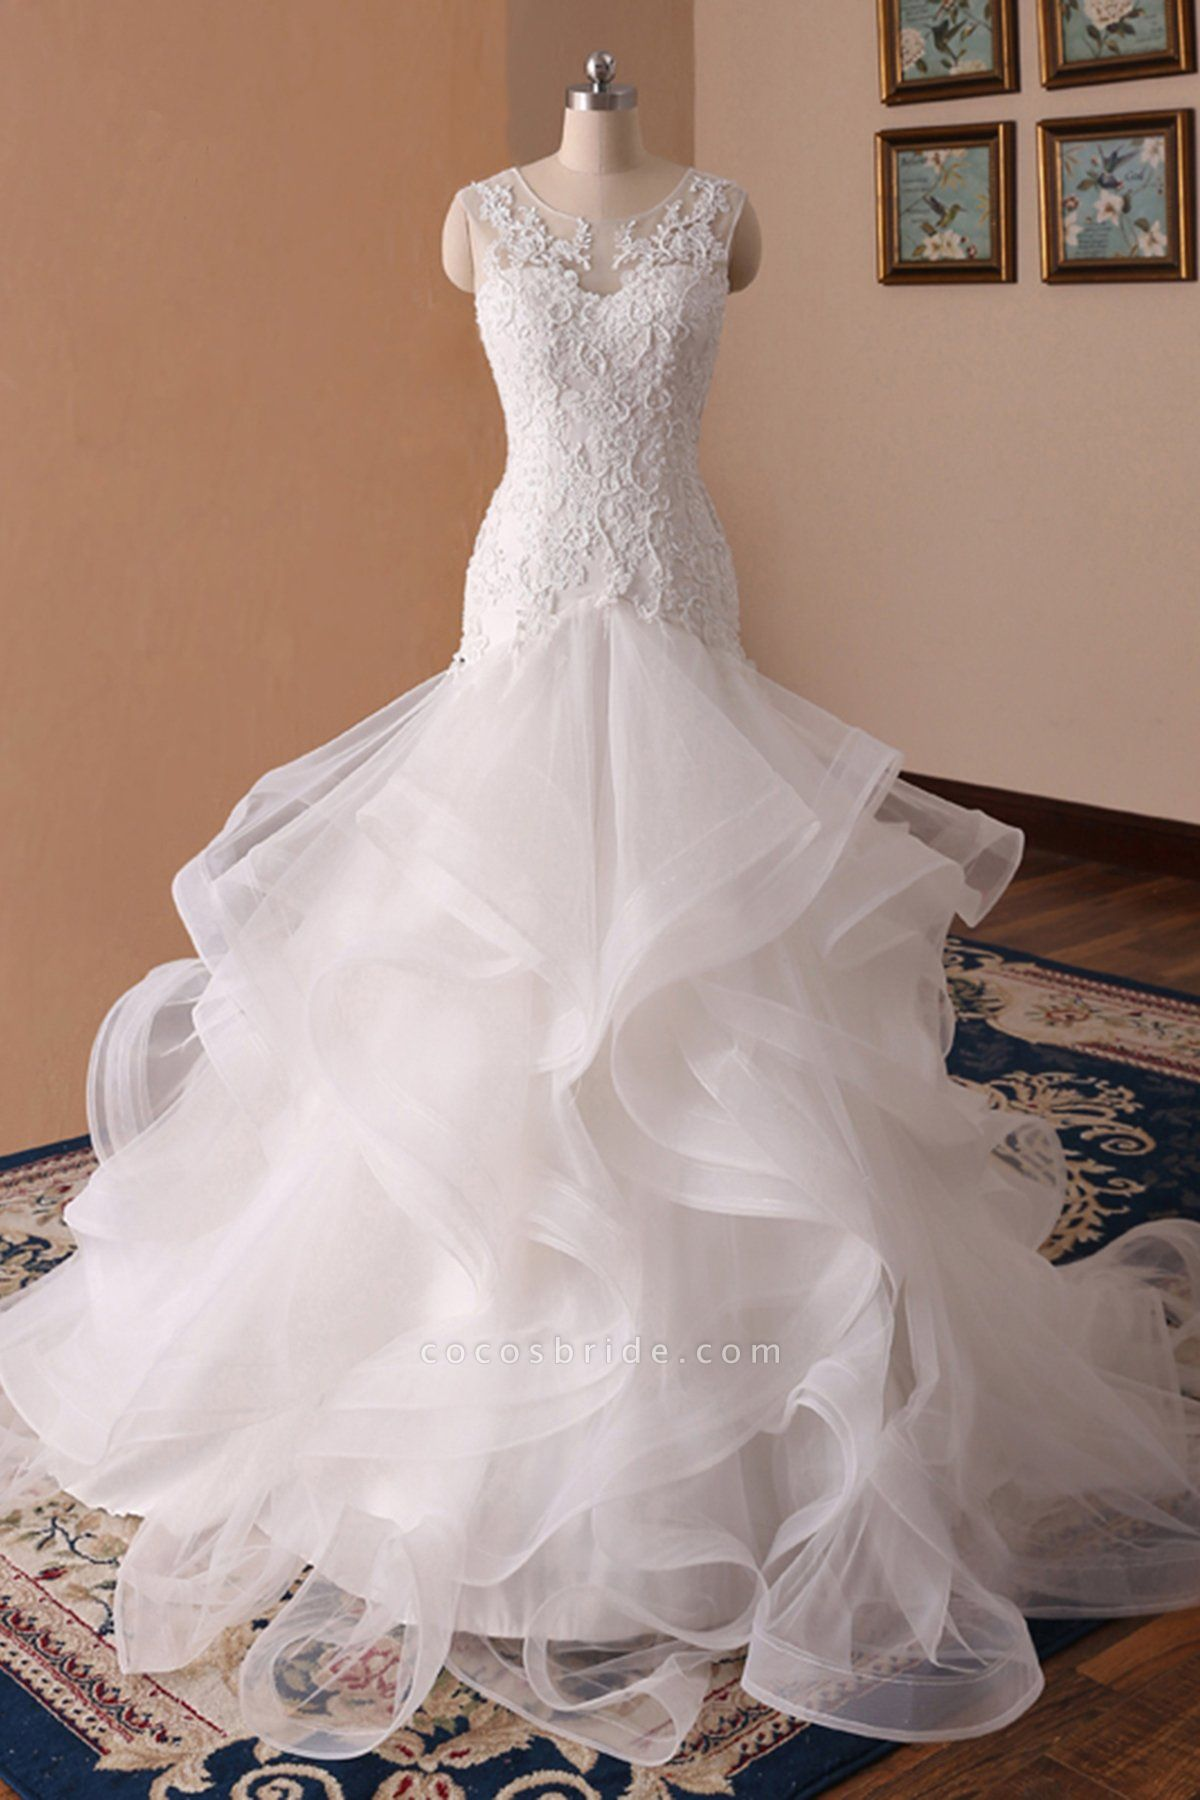 White Lace Ruffled Long Corset Bridal Mermaid Wedding Dress